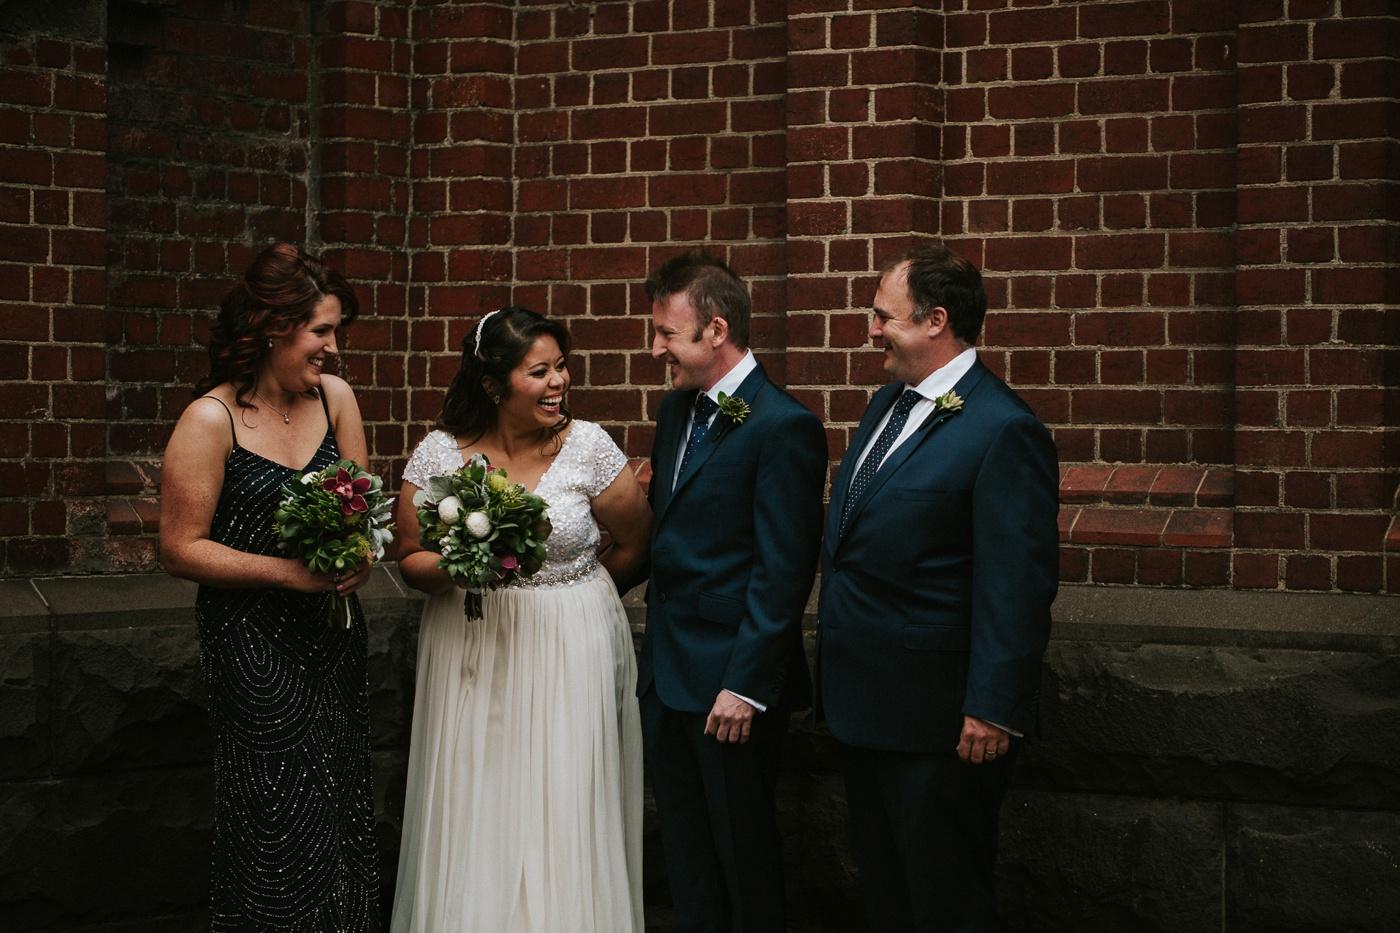 anitadaniel_melbourne-scienceworks-relaxed-fun-geek-wedding_melbourne-candid-wedding-photography_10